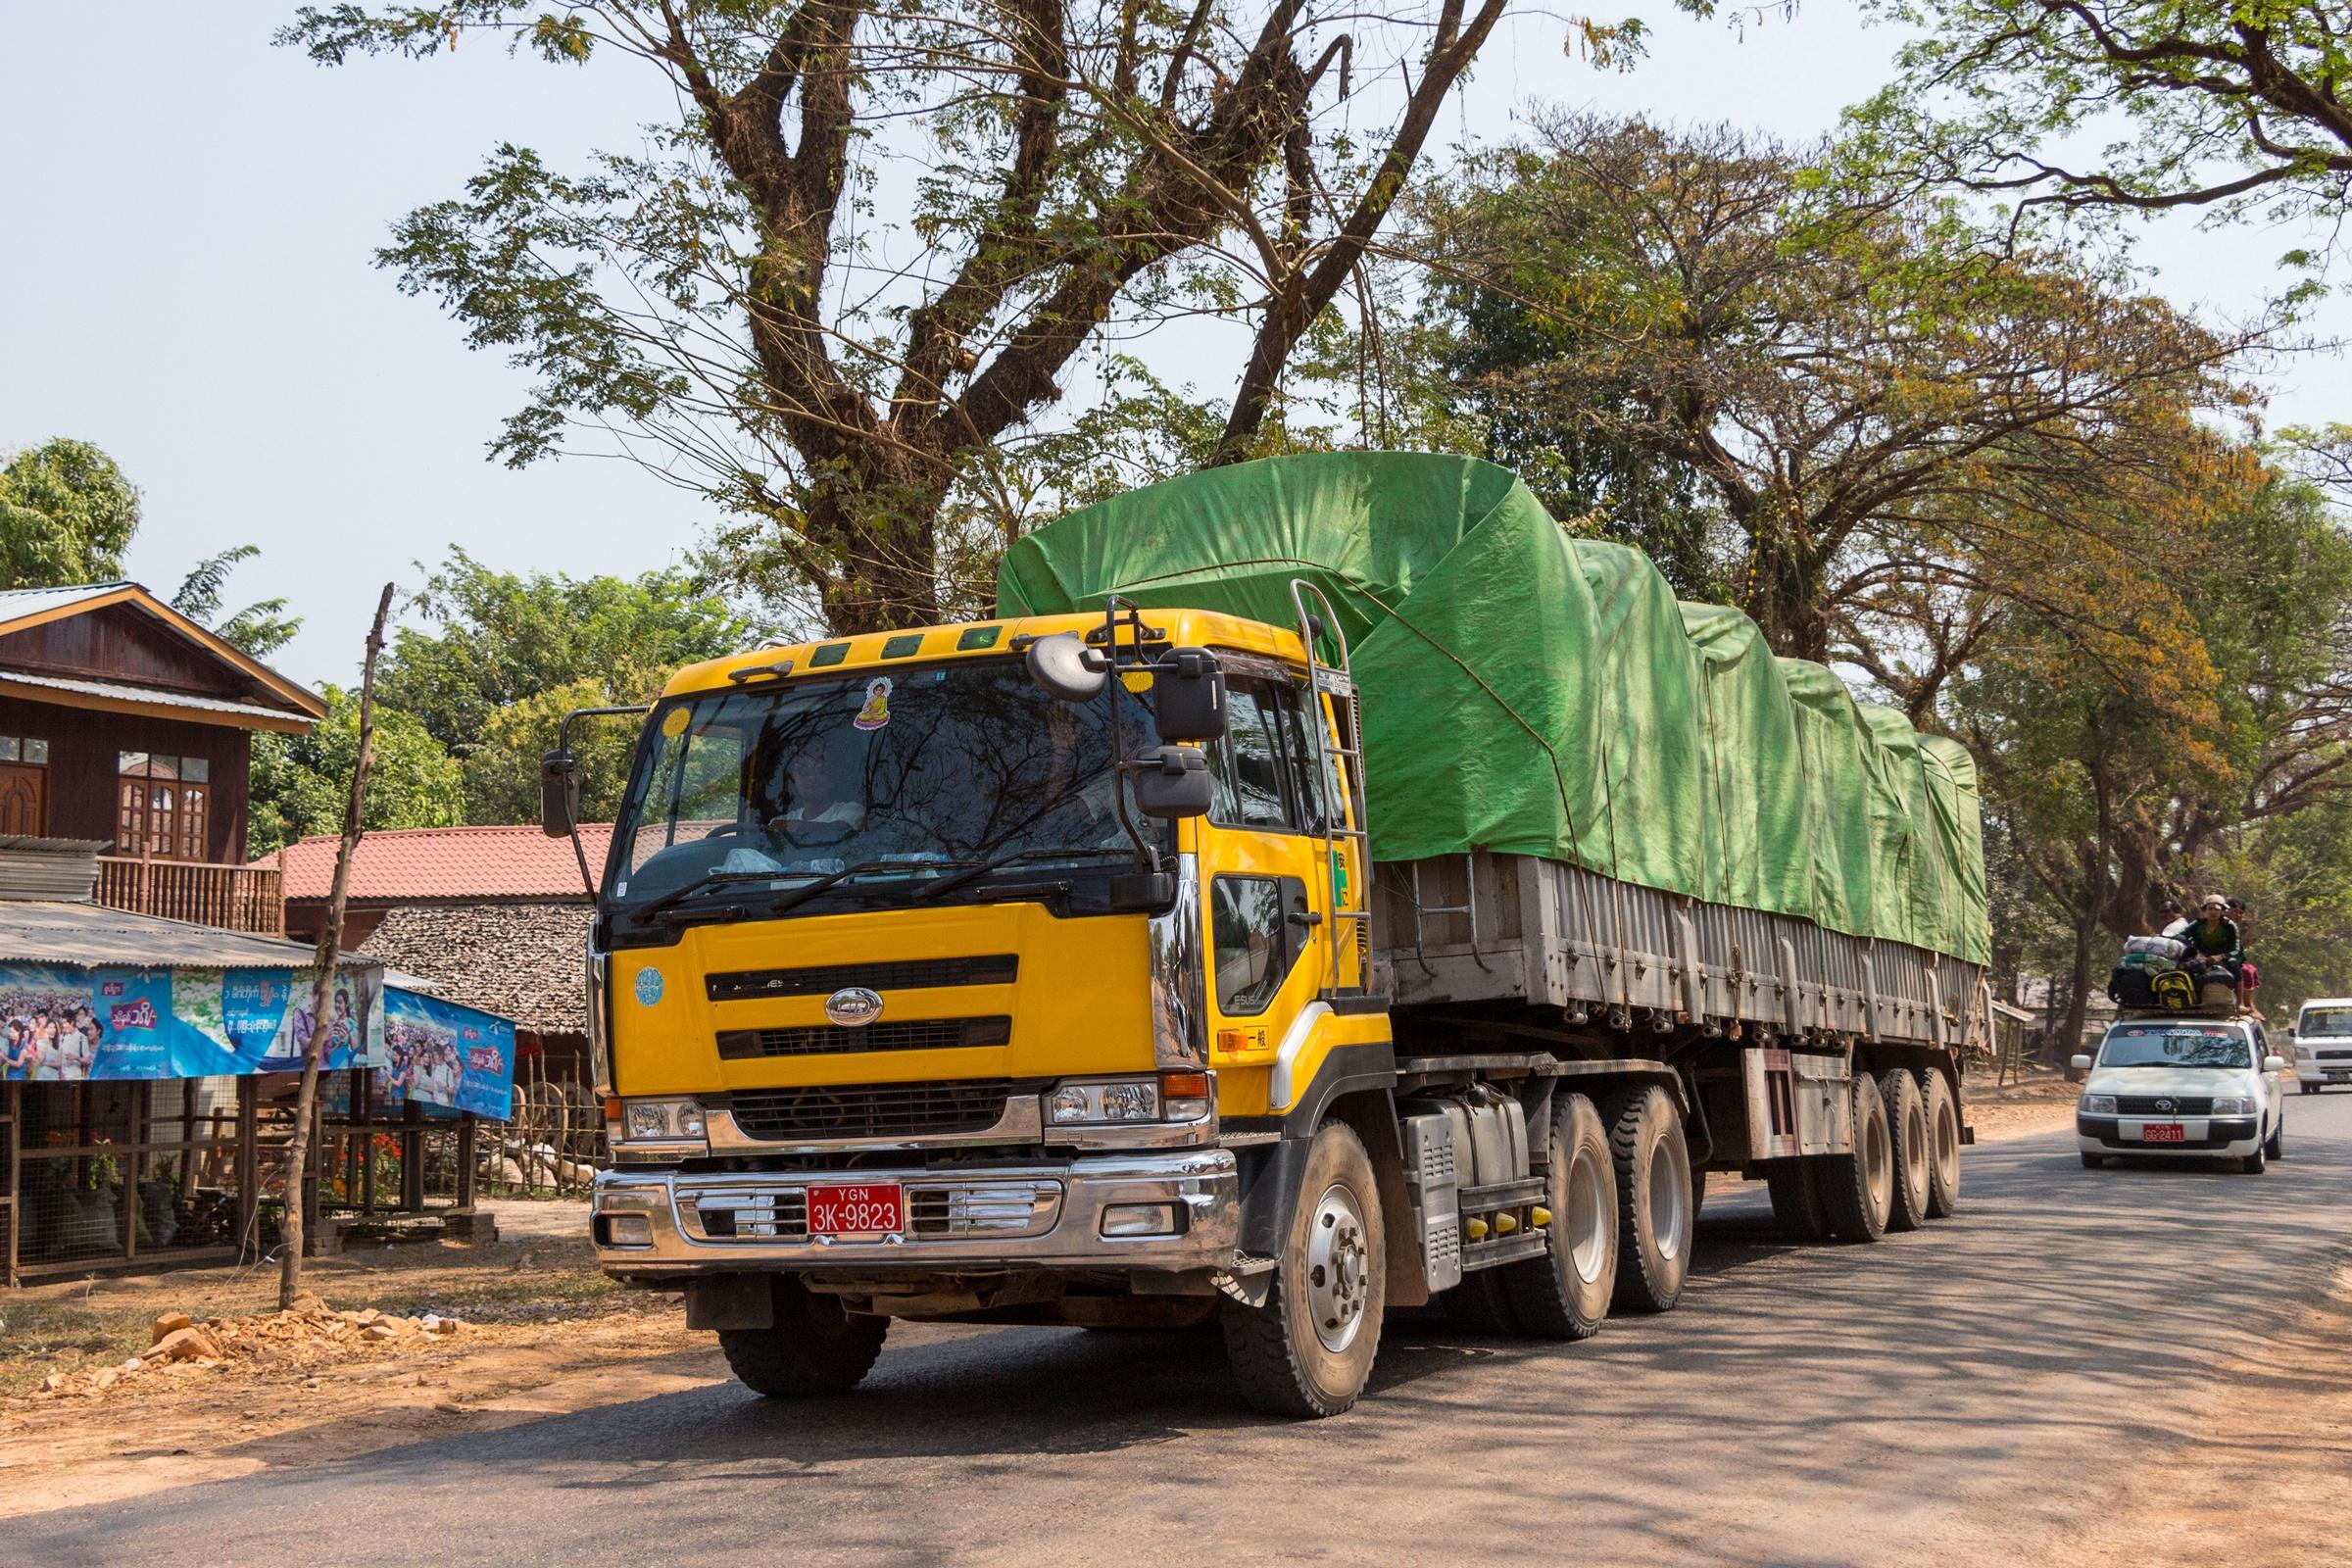 Nissan Diesel Truck >> File Nissan Diesel Truck In Myanmar Jpg Wikimedia Commons